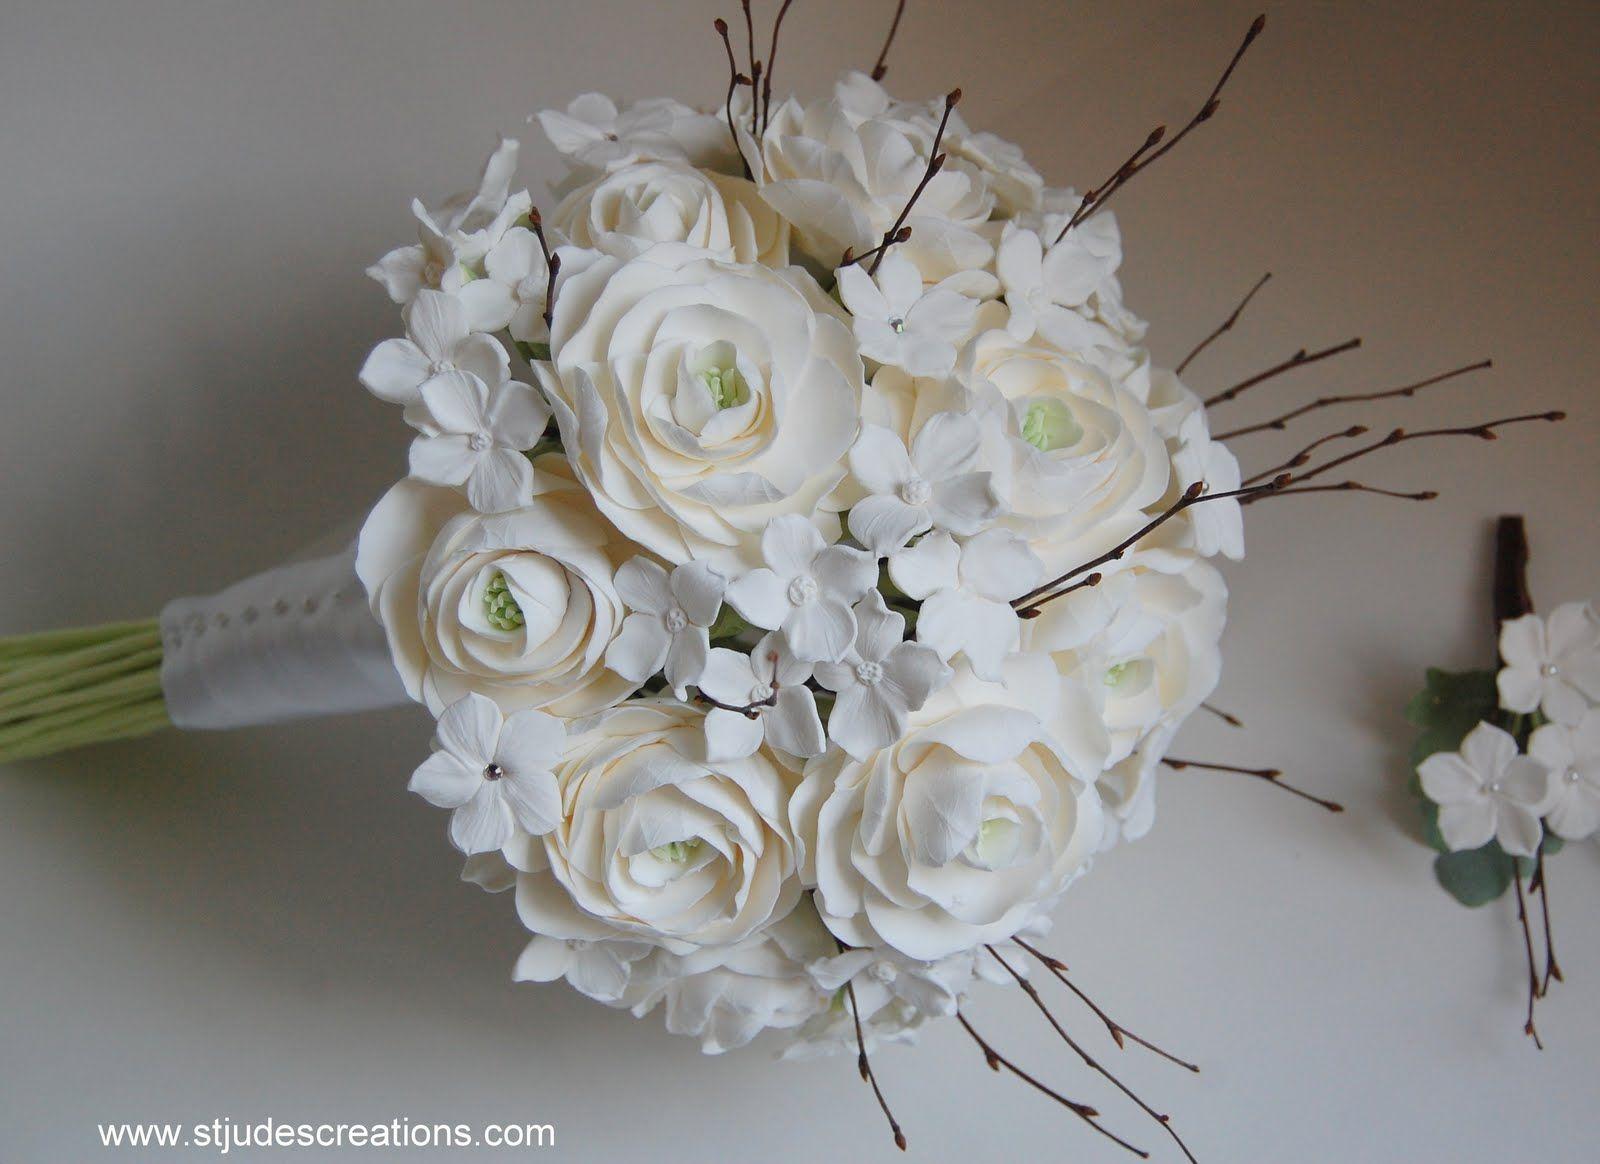 Amazing winter wedding bouquets dsc 3020 2016g 16001164 winter wedding bouquet with twigs in clay ranunculushydrangeastephanotis izmirmasajfo Choice Image